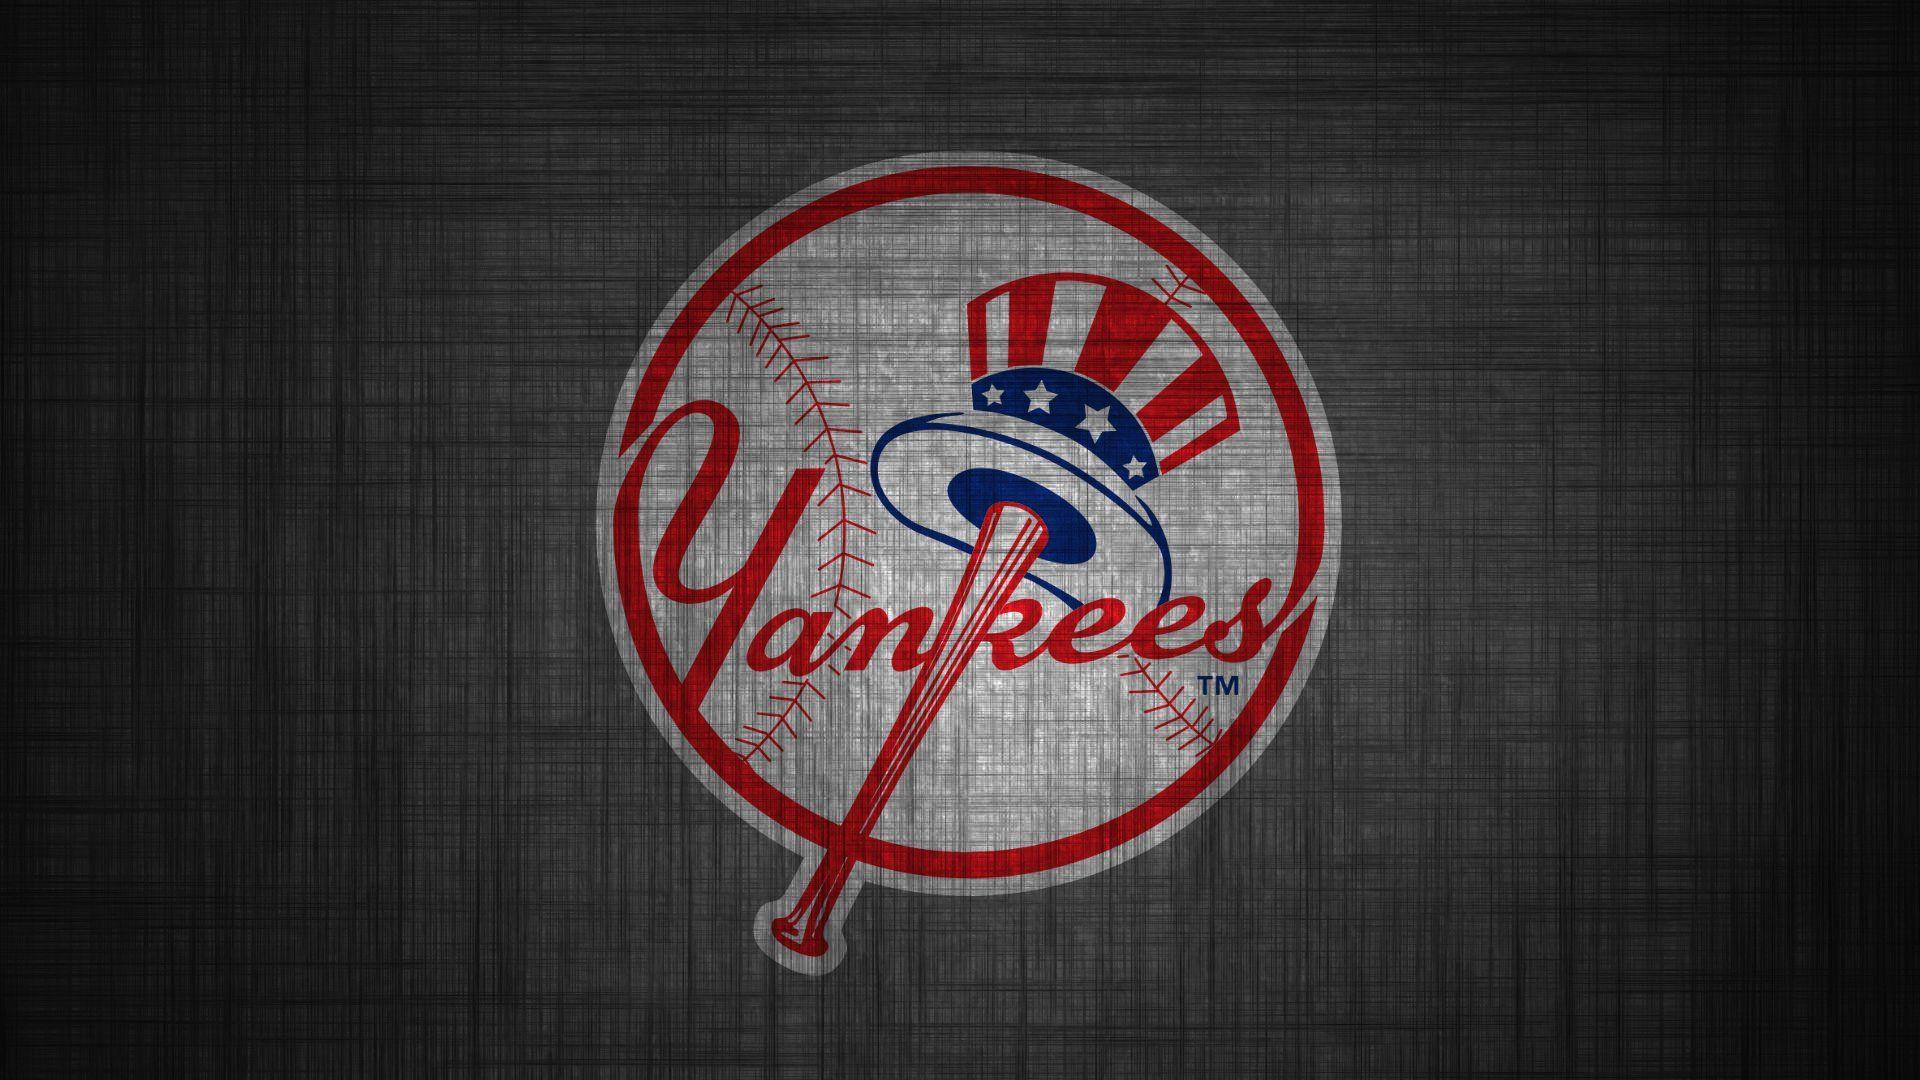 New York Yankees background hd